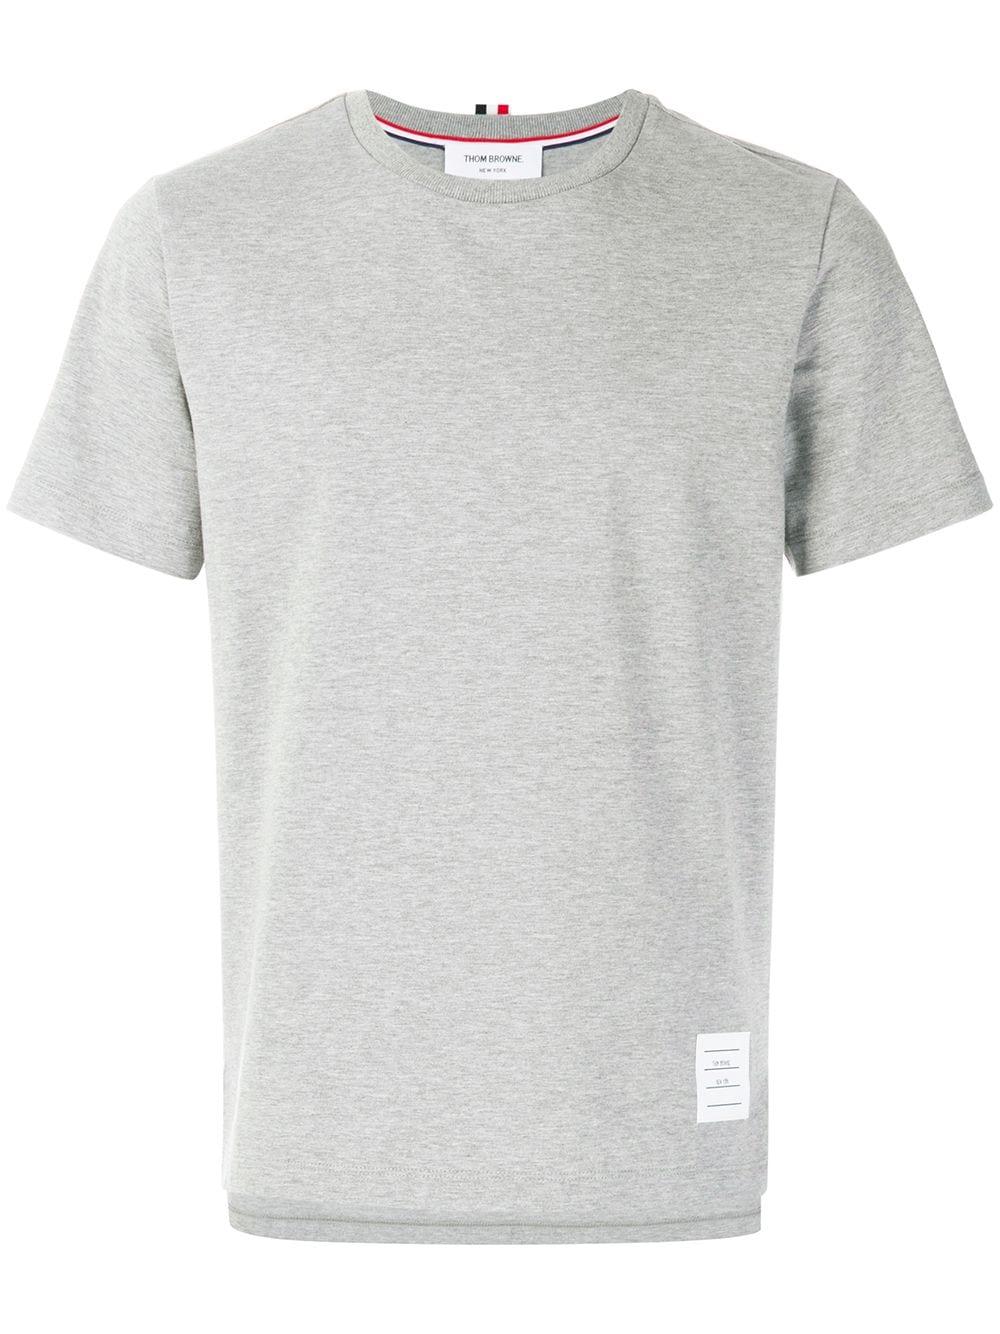 Camiseta de Thom Browne / Foto: Farfetch